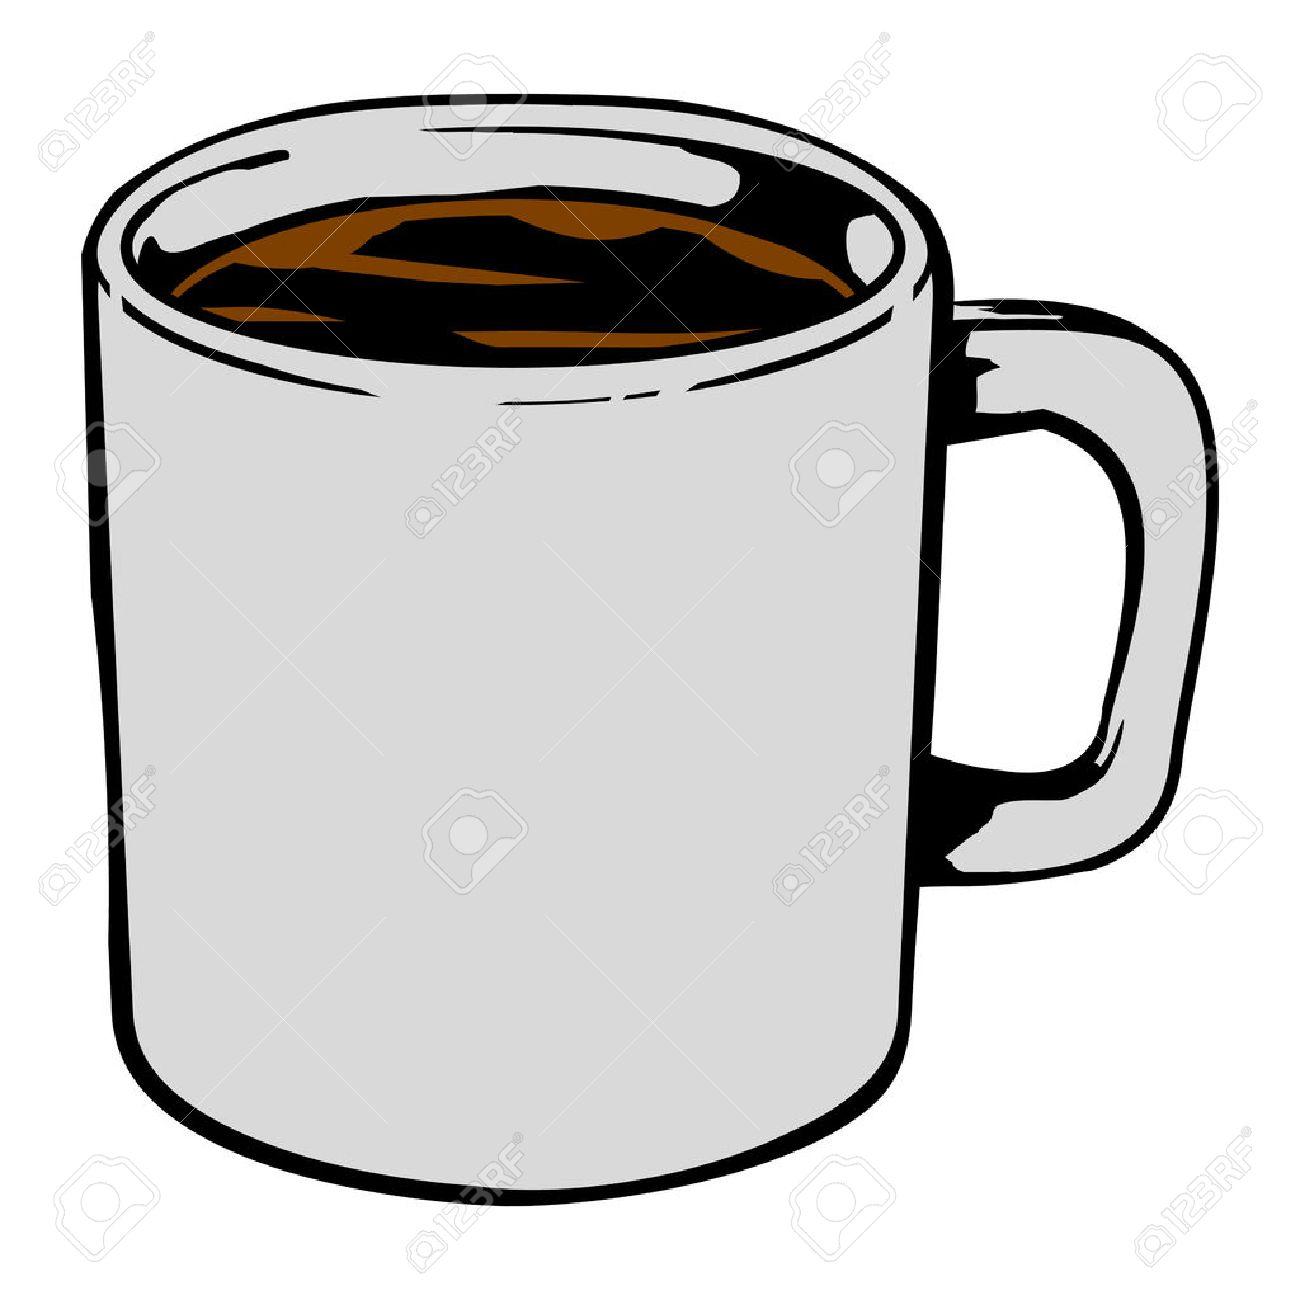 Coffee cup vector free - Coffee Mug Vector Icon Stock Vector 49536815